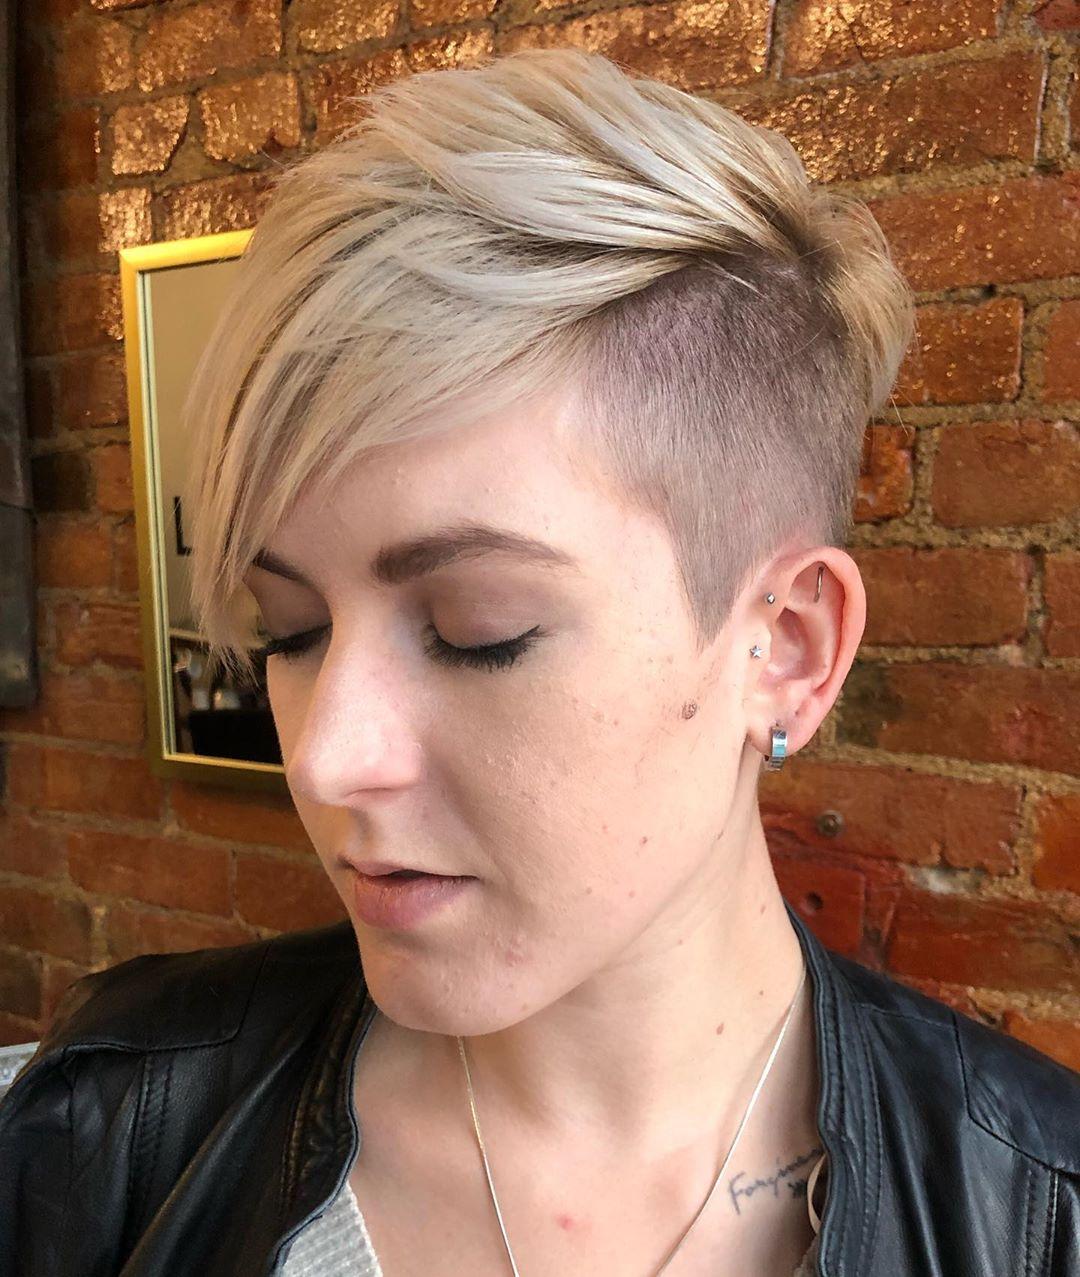 Short back & sides blonde haircut